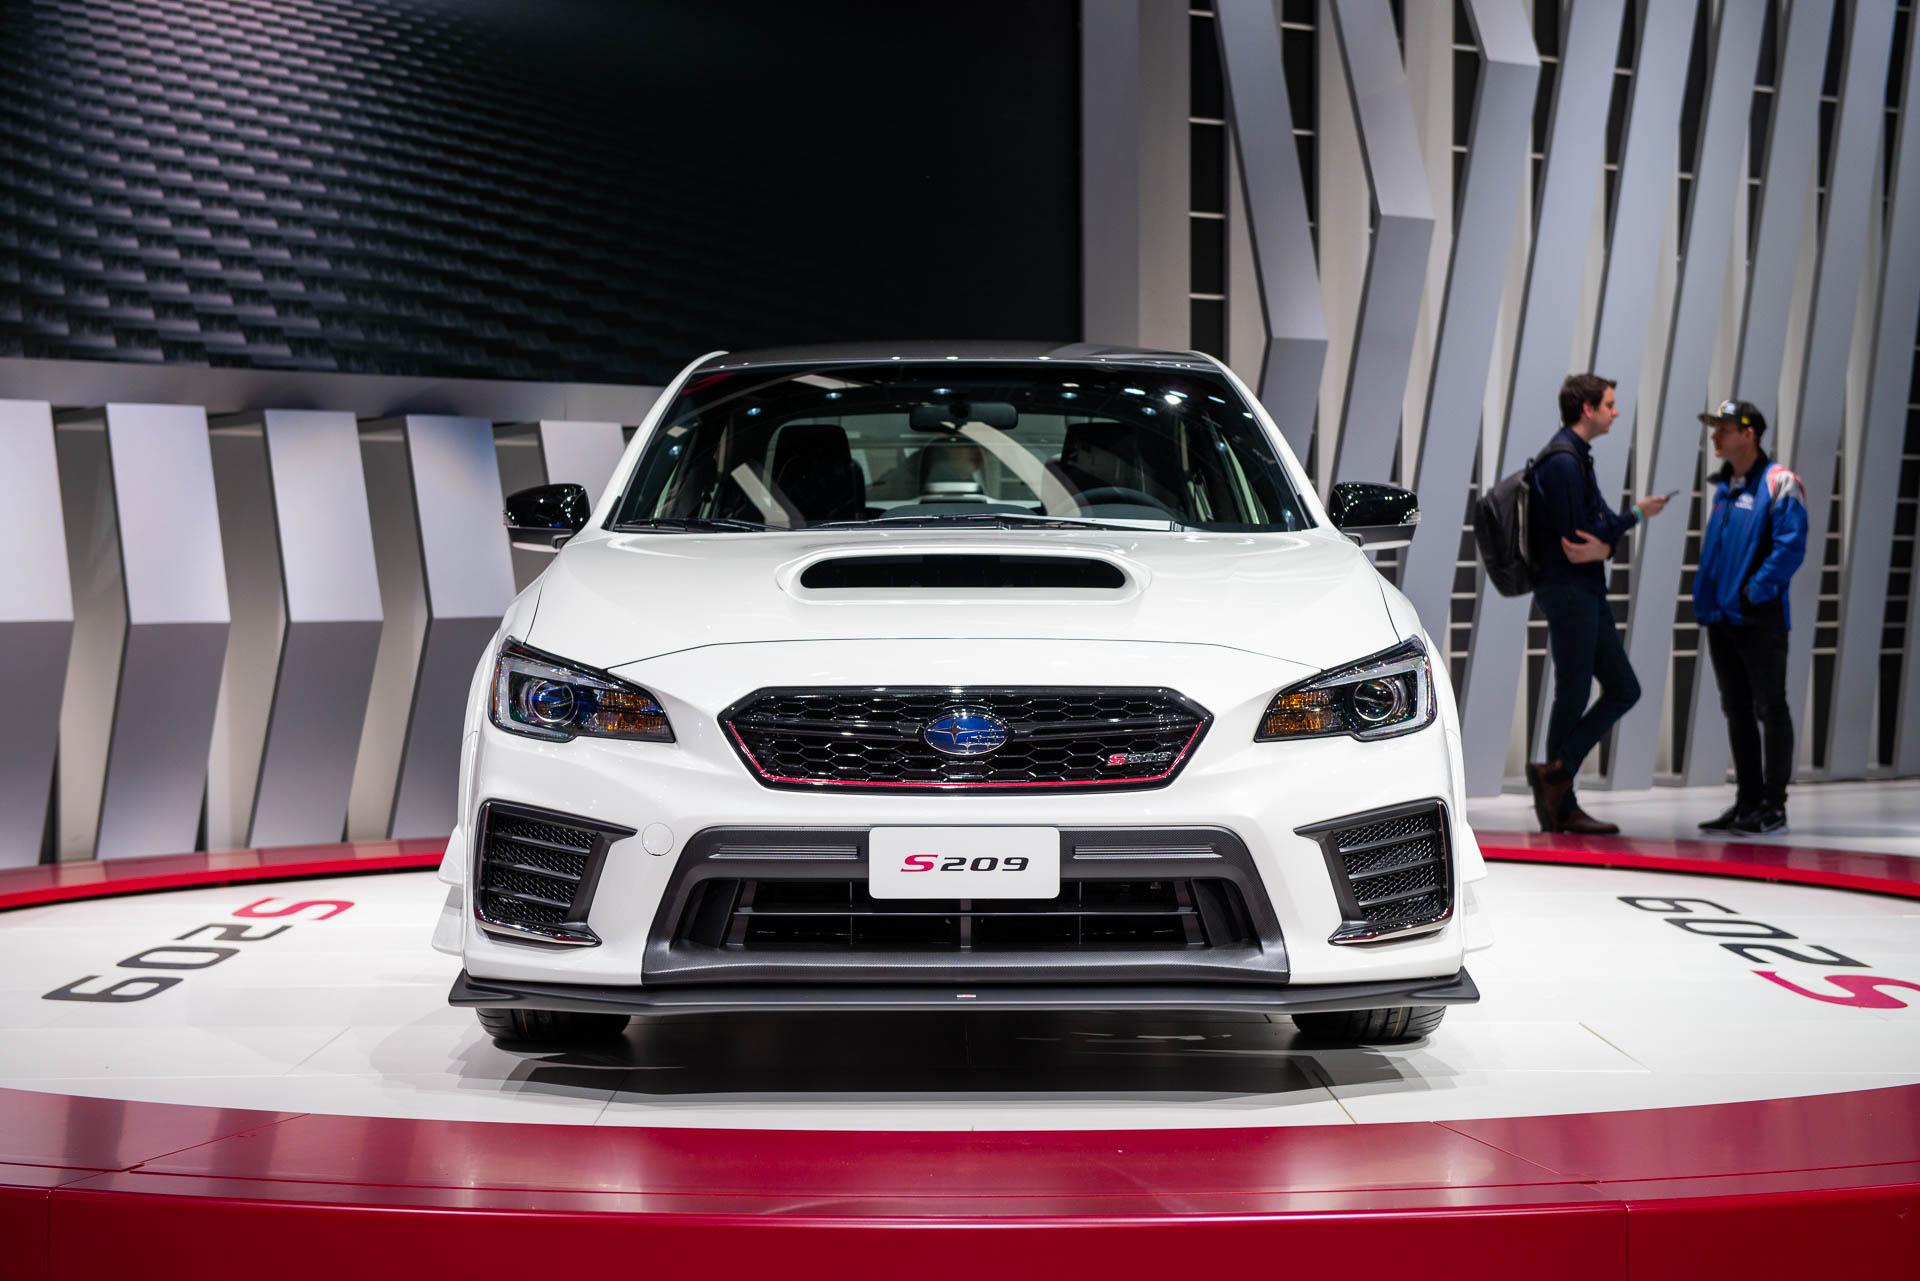 2019 Subaru Wrx Sti 2020 Genesis Gv80 Bugatti Royale